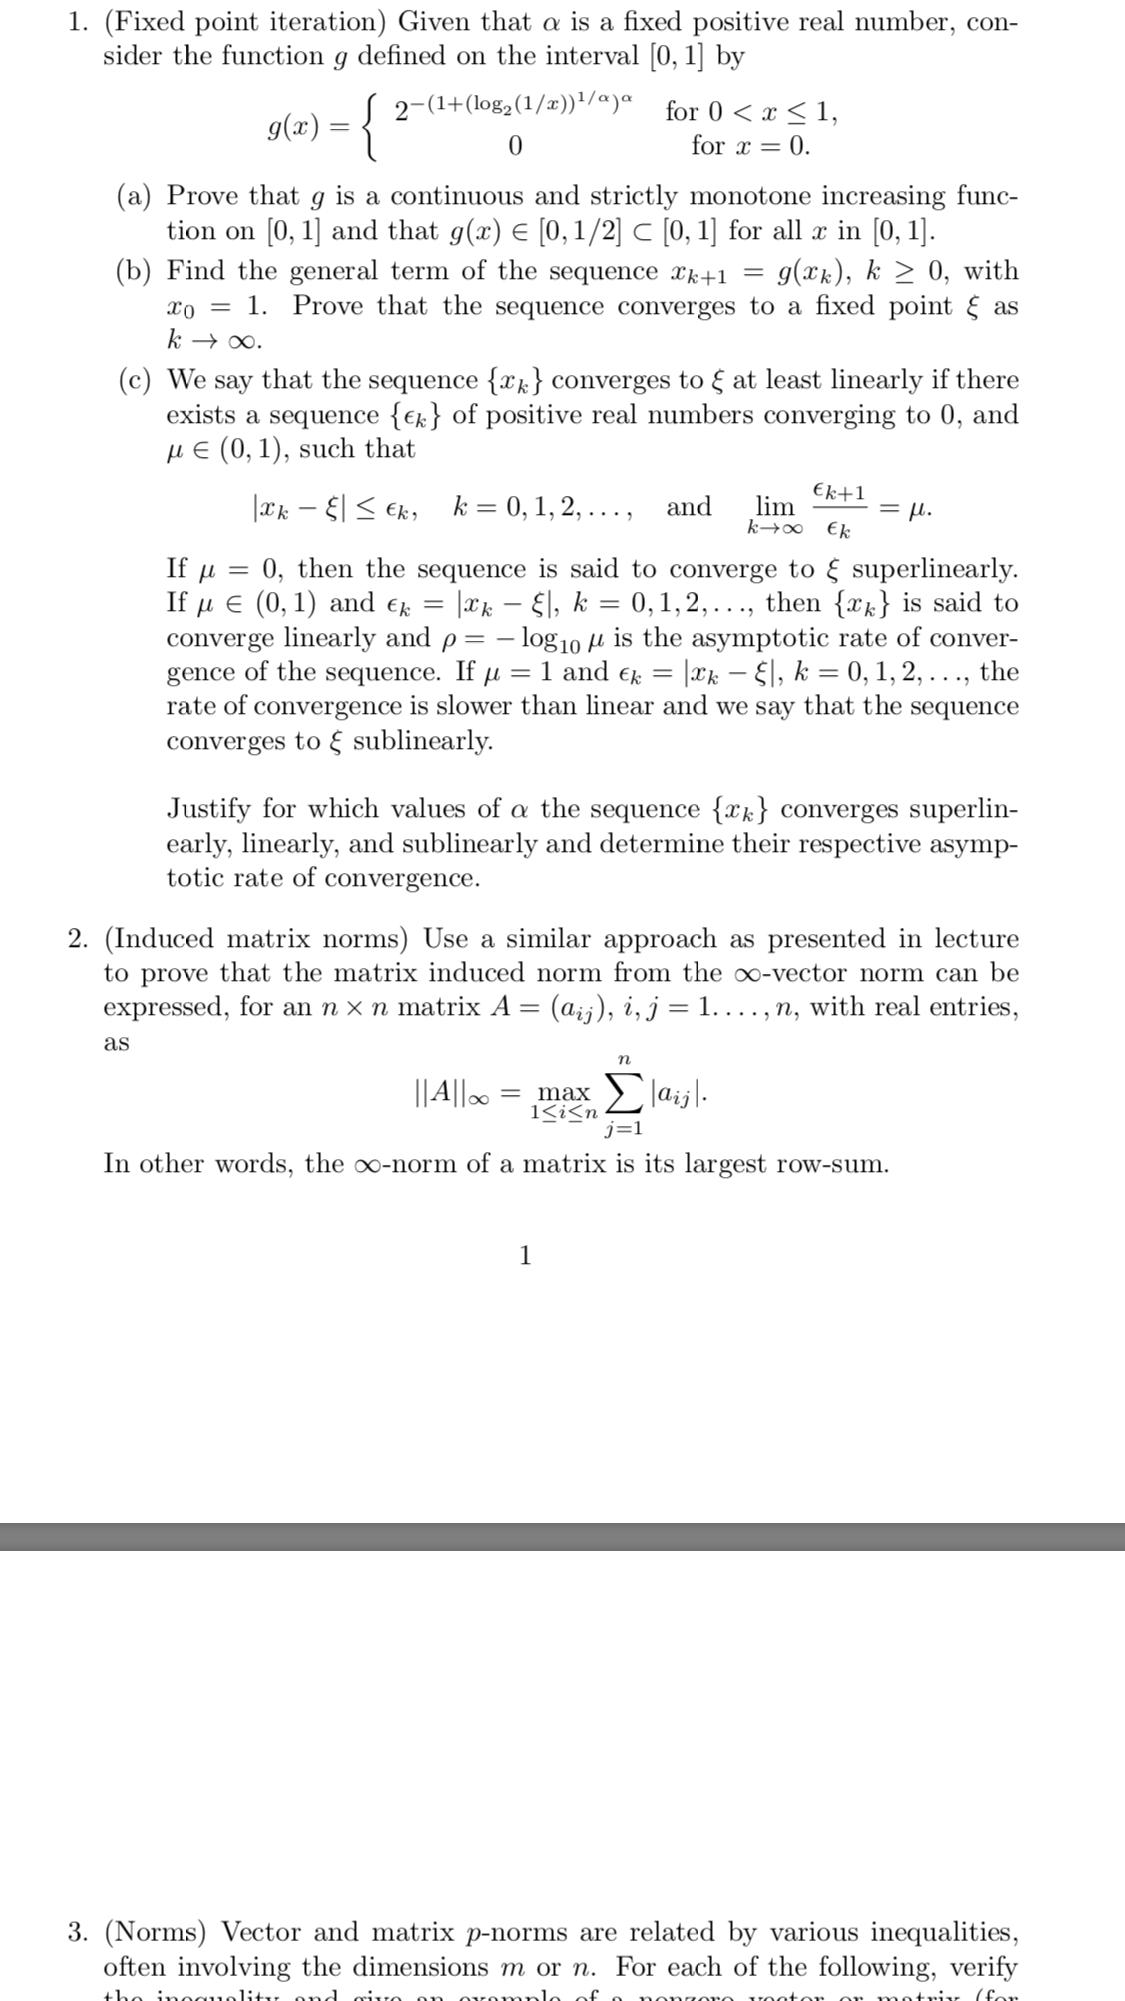 Numerical analysis homework help